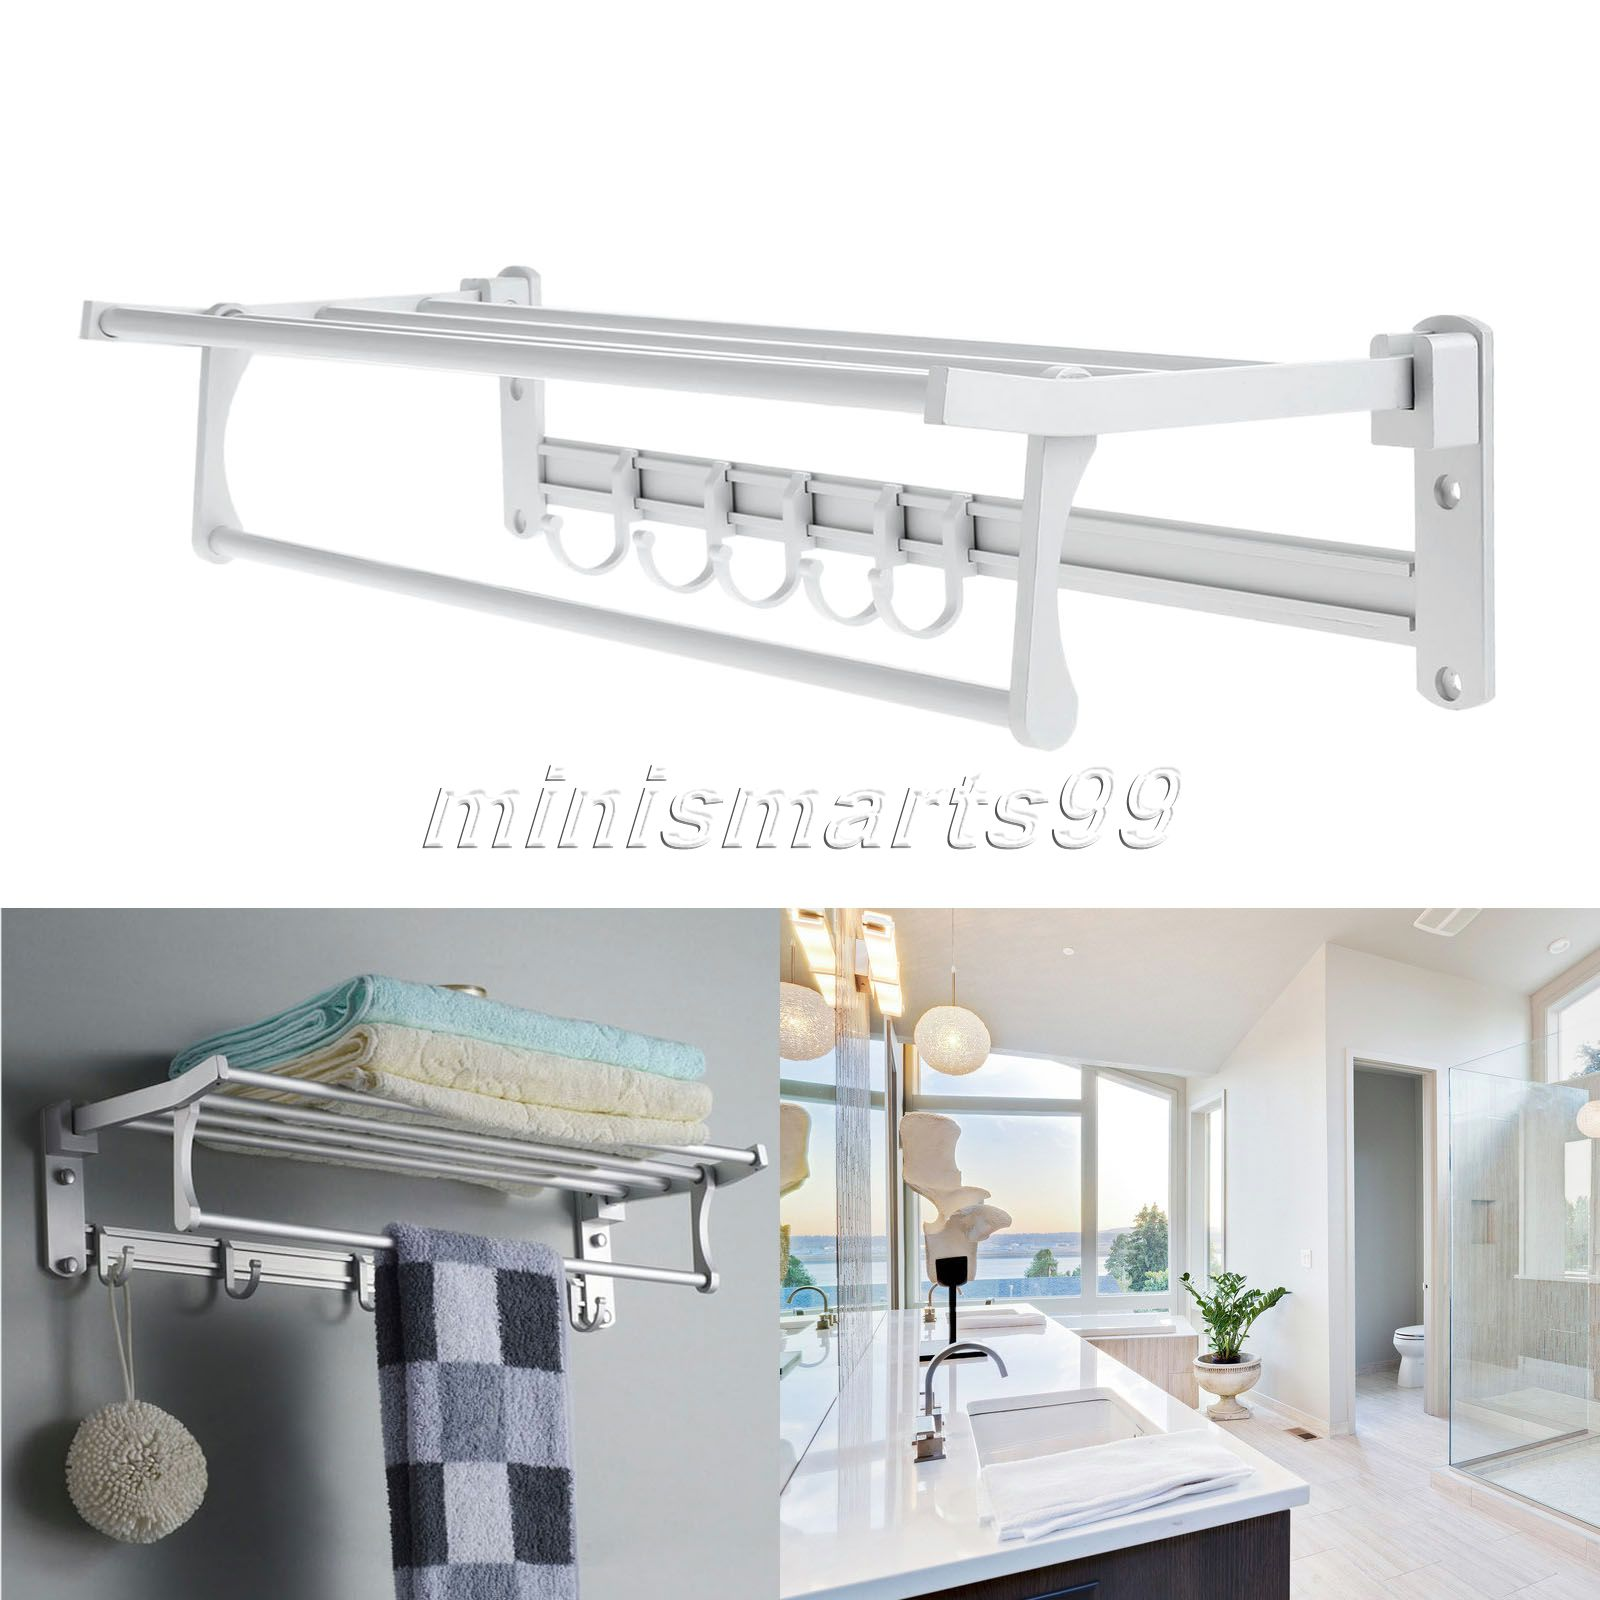 Bathroom towel corner shelves holders aluminum wall for Bathroom accessories racks